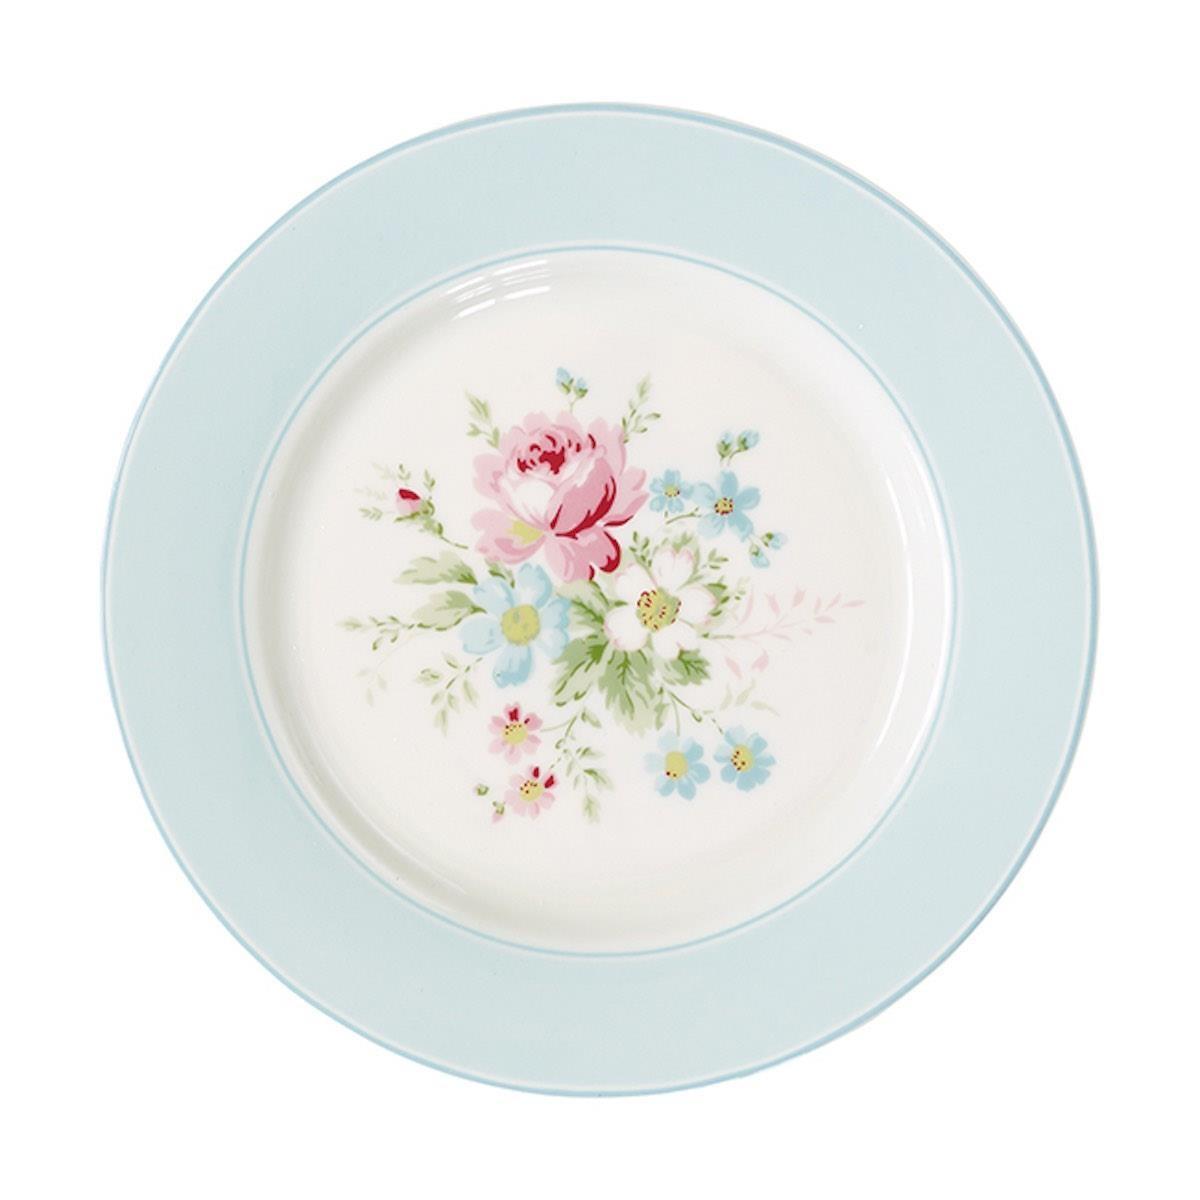 Marie Blue餐盤 原價820元,特價246元。圖片提供_GREENGATE TAIWAN